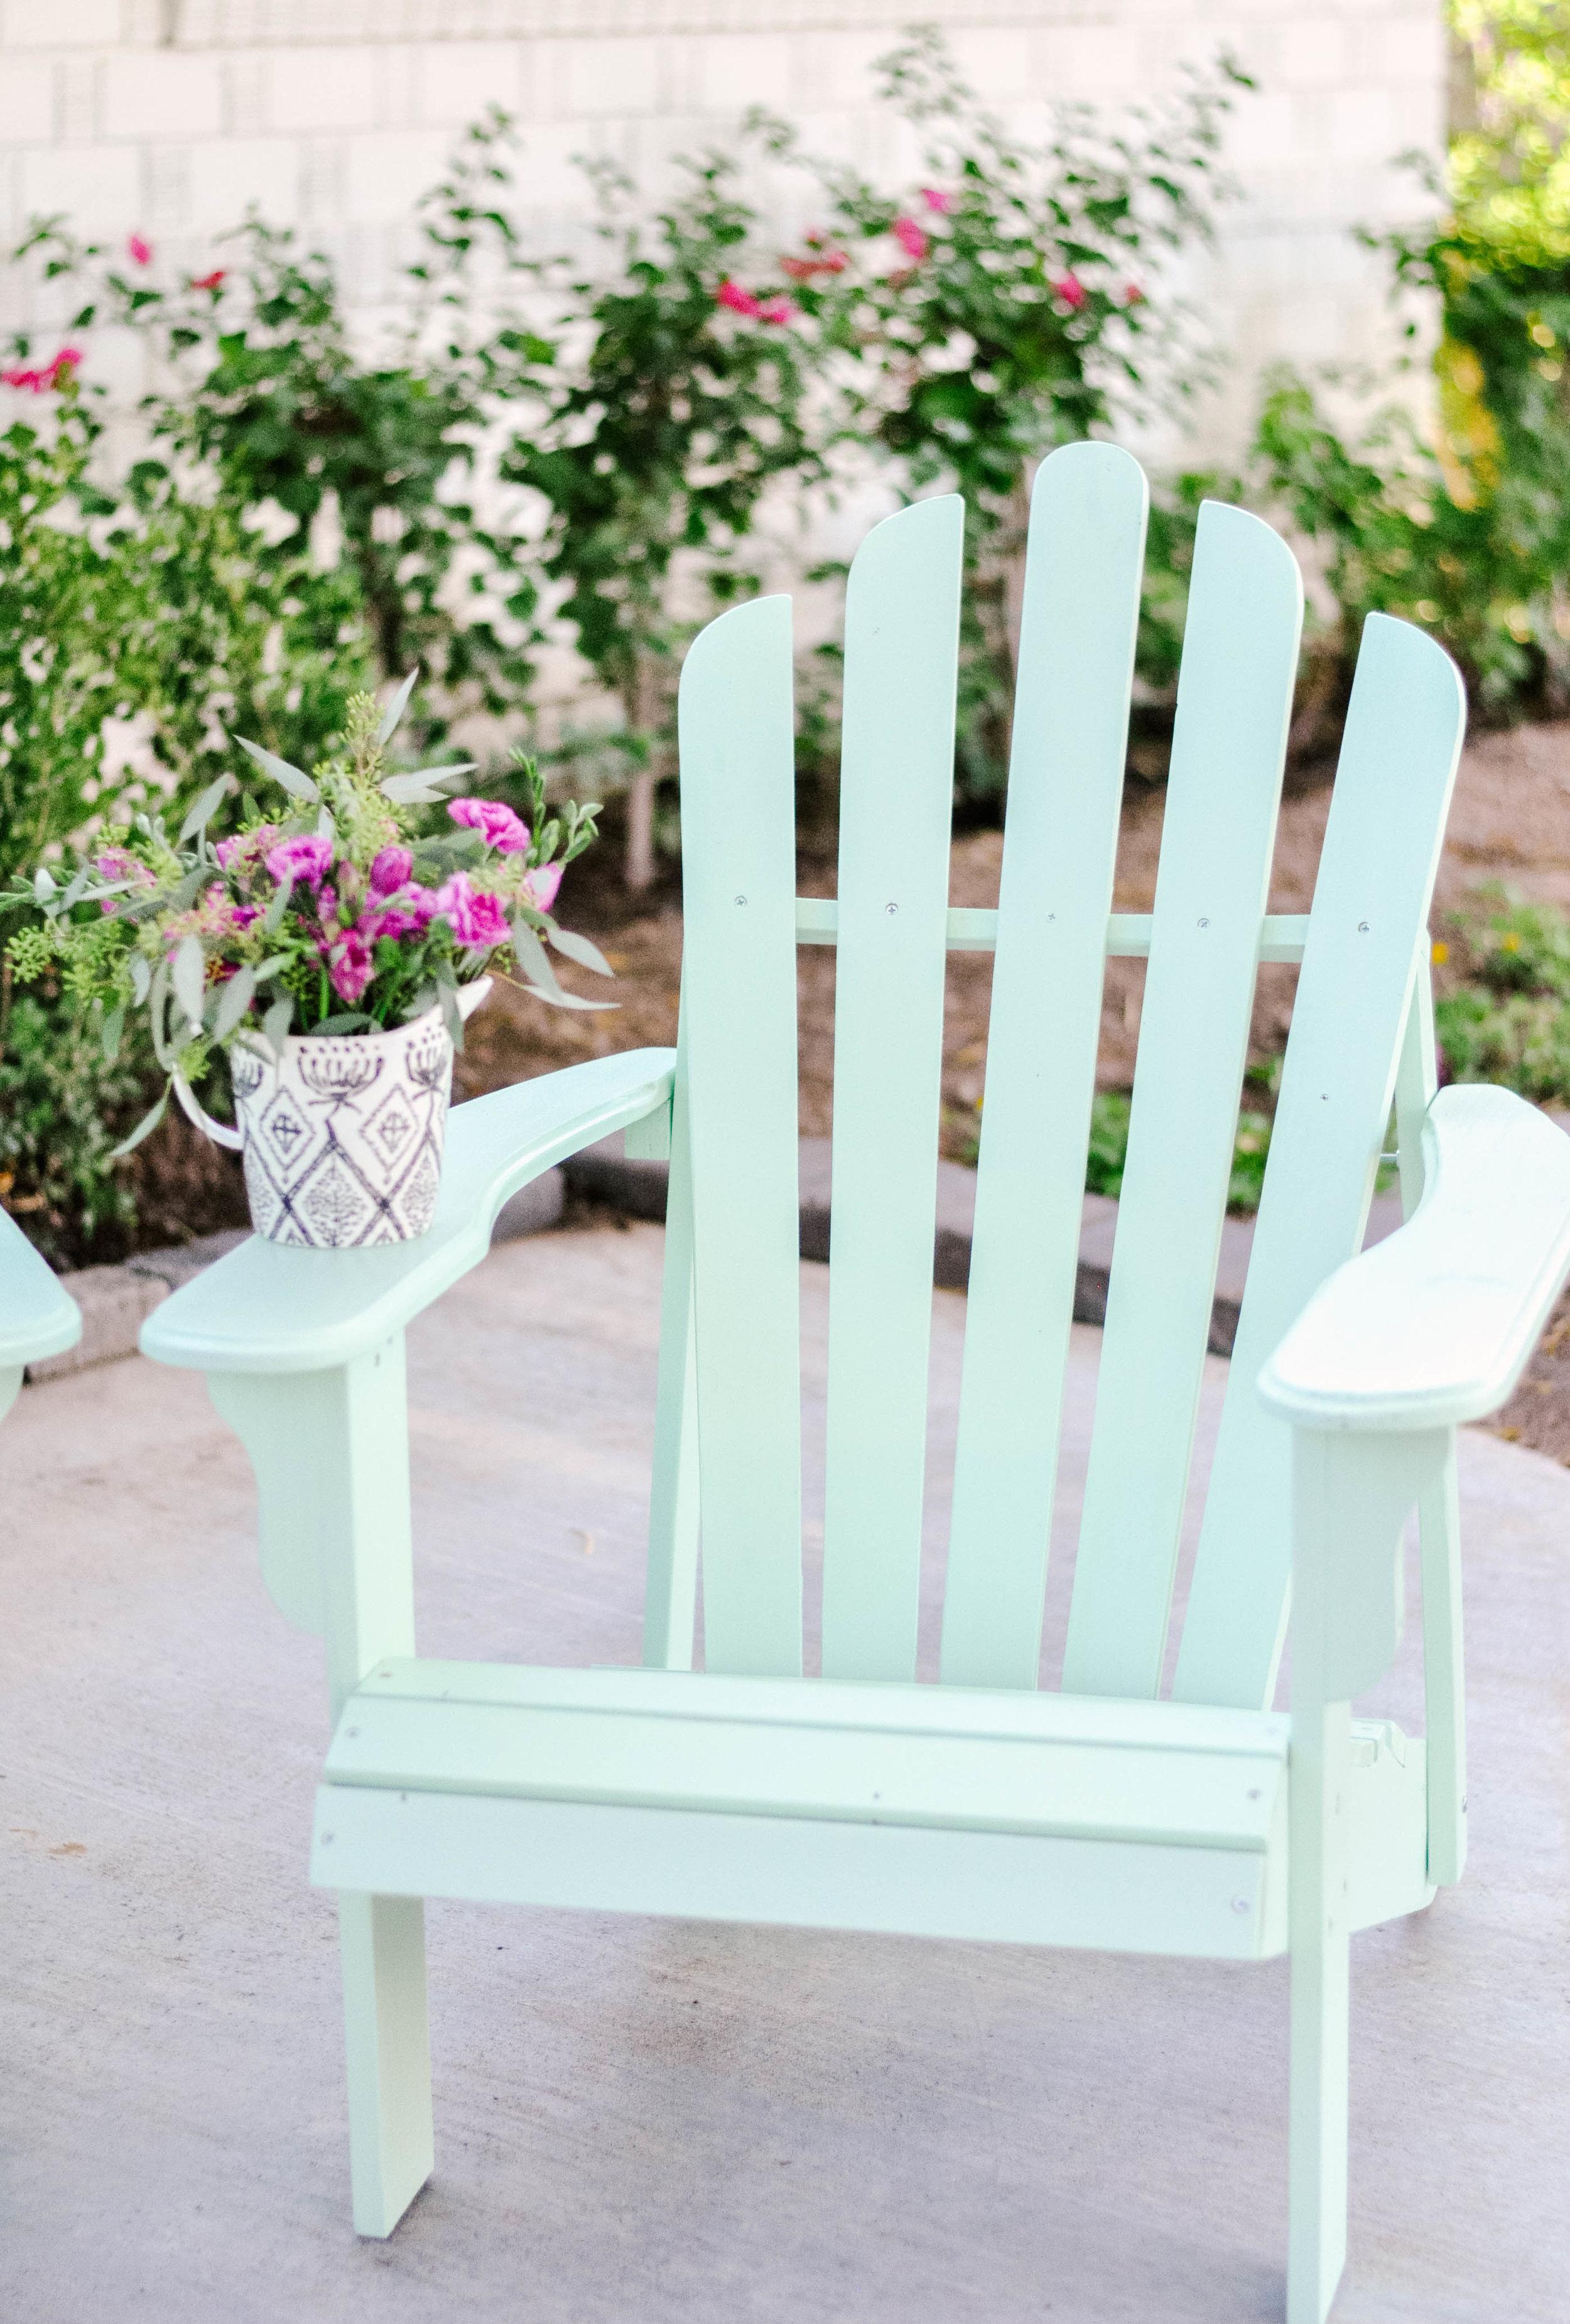 DIY Painted Adirondack Chairs